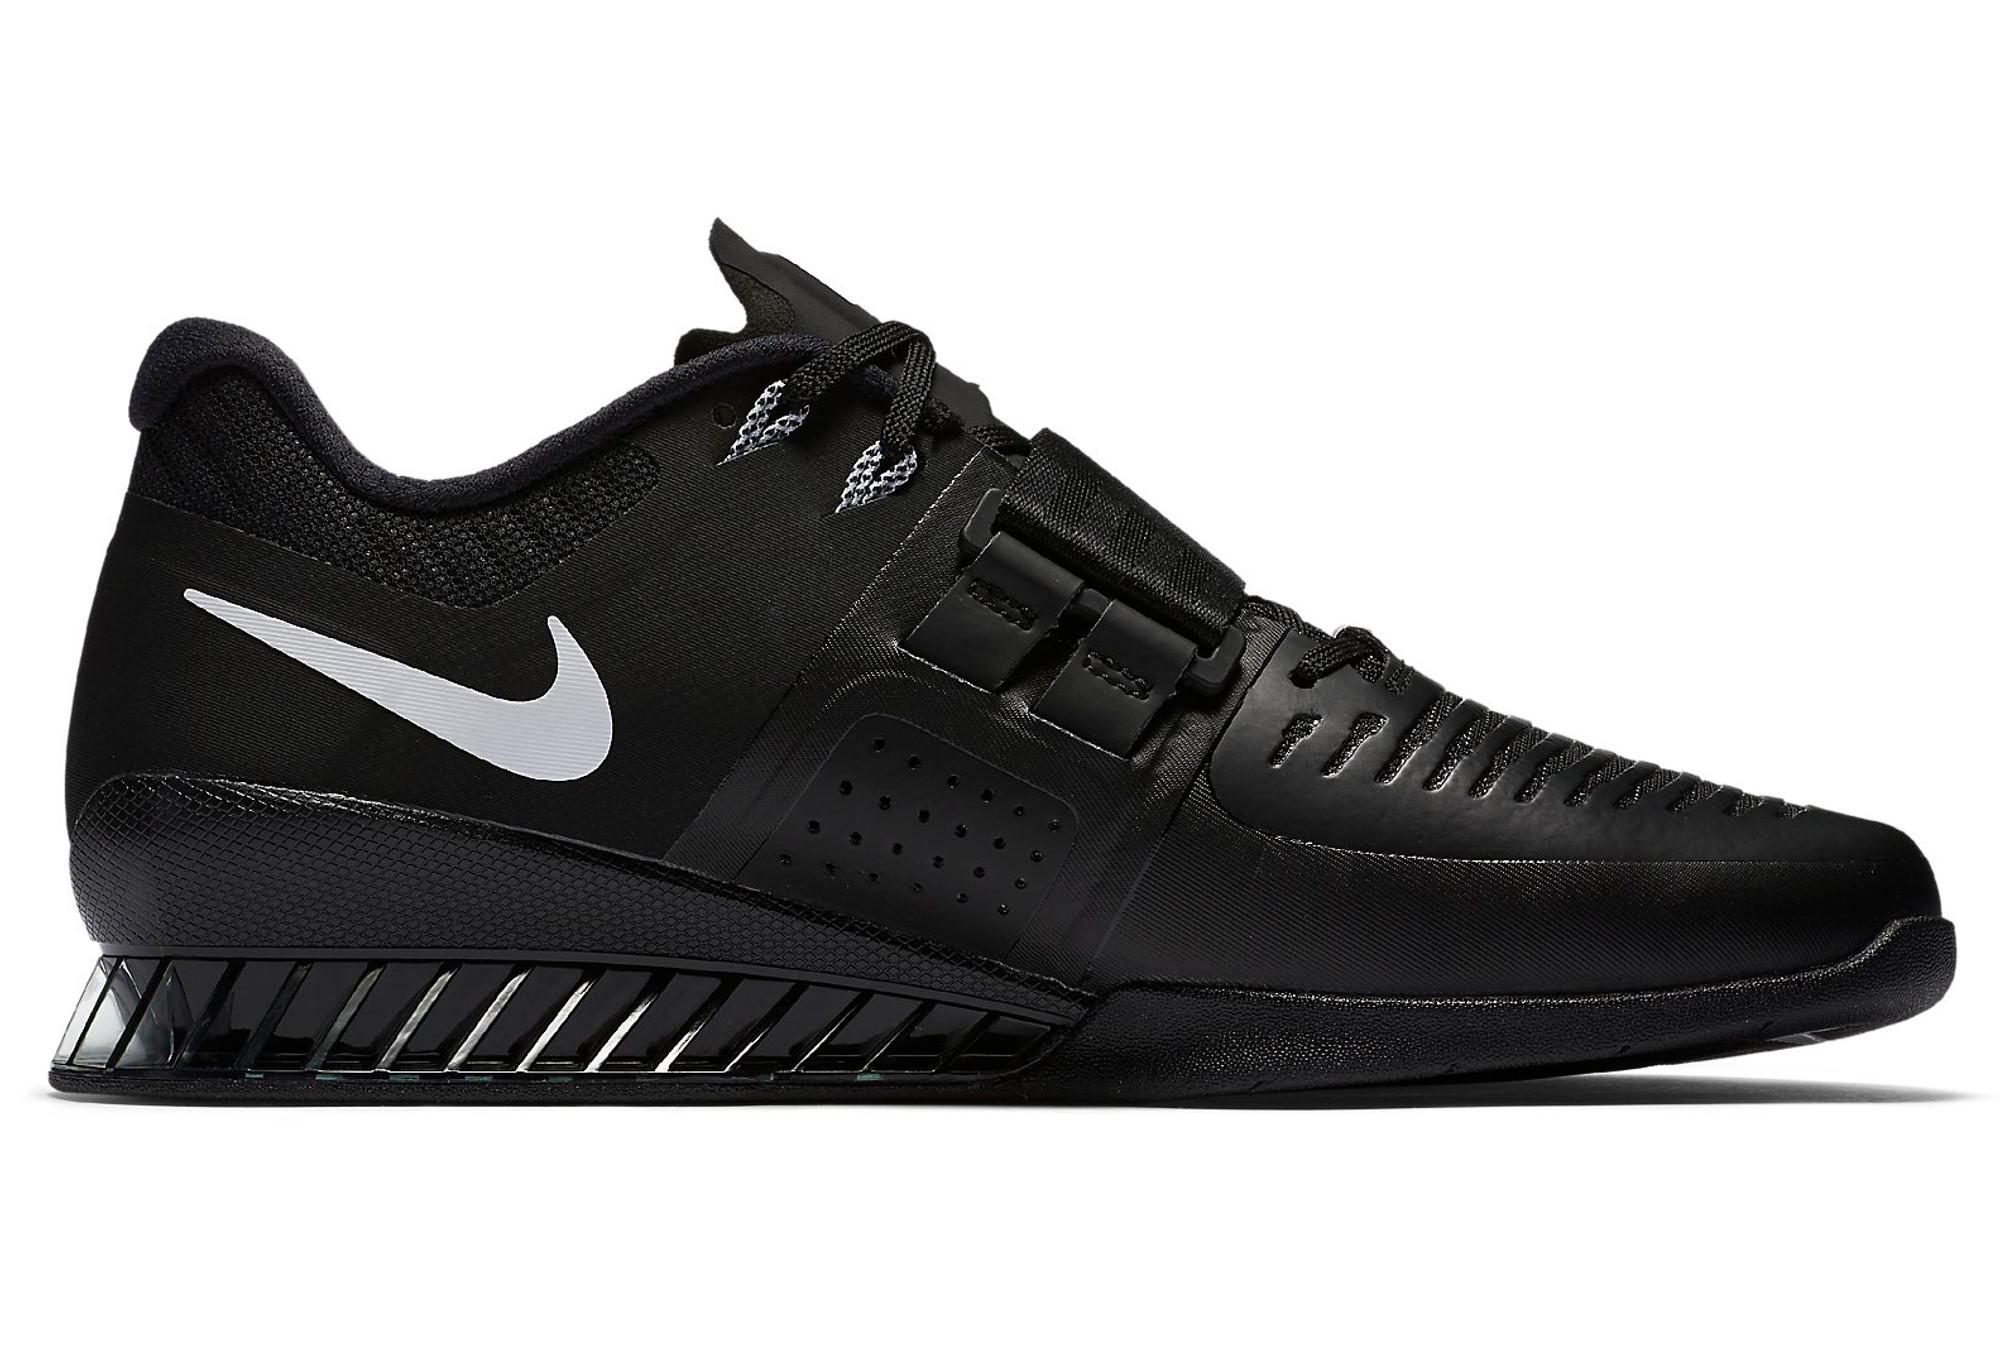 chaussures de cross training nike romaleos 3 noir. Black Bedroom Furniture Sets. Home Design Ideas